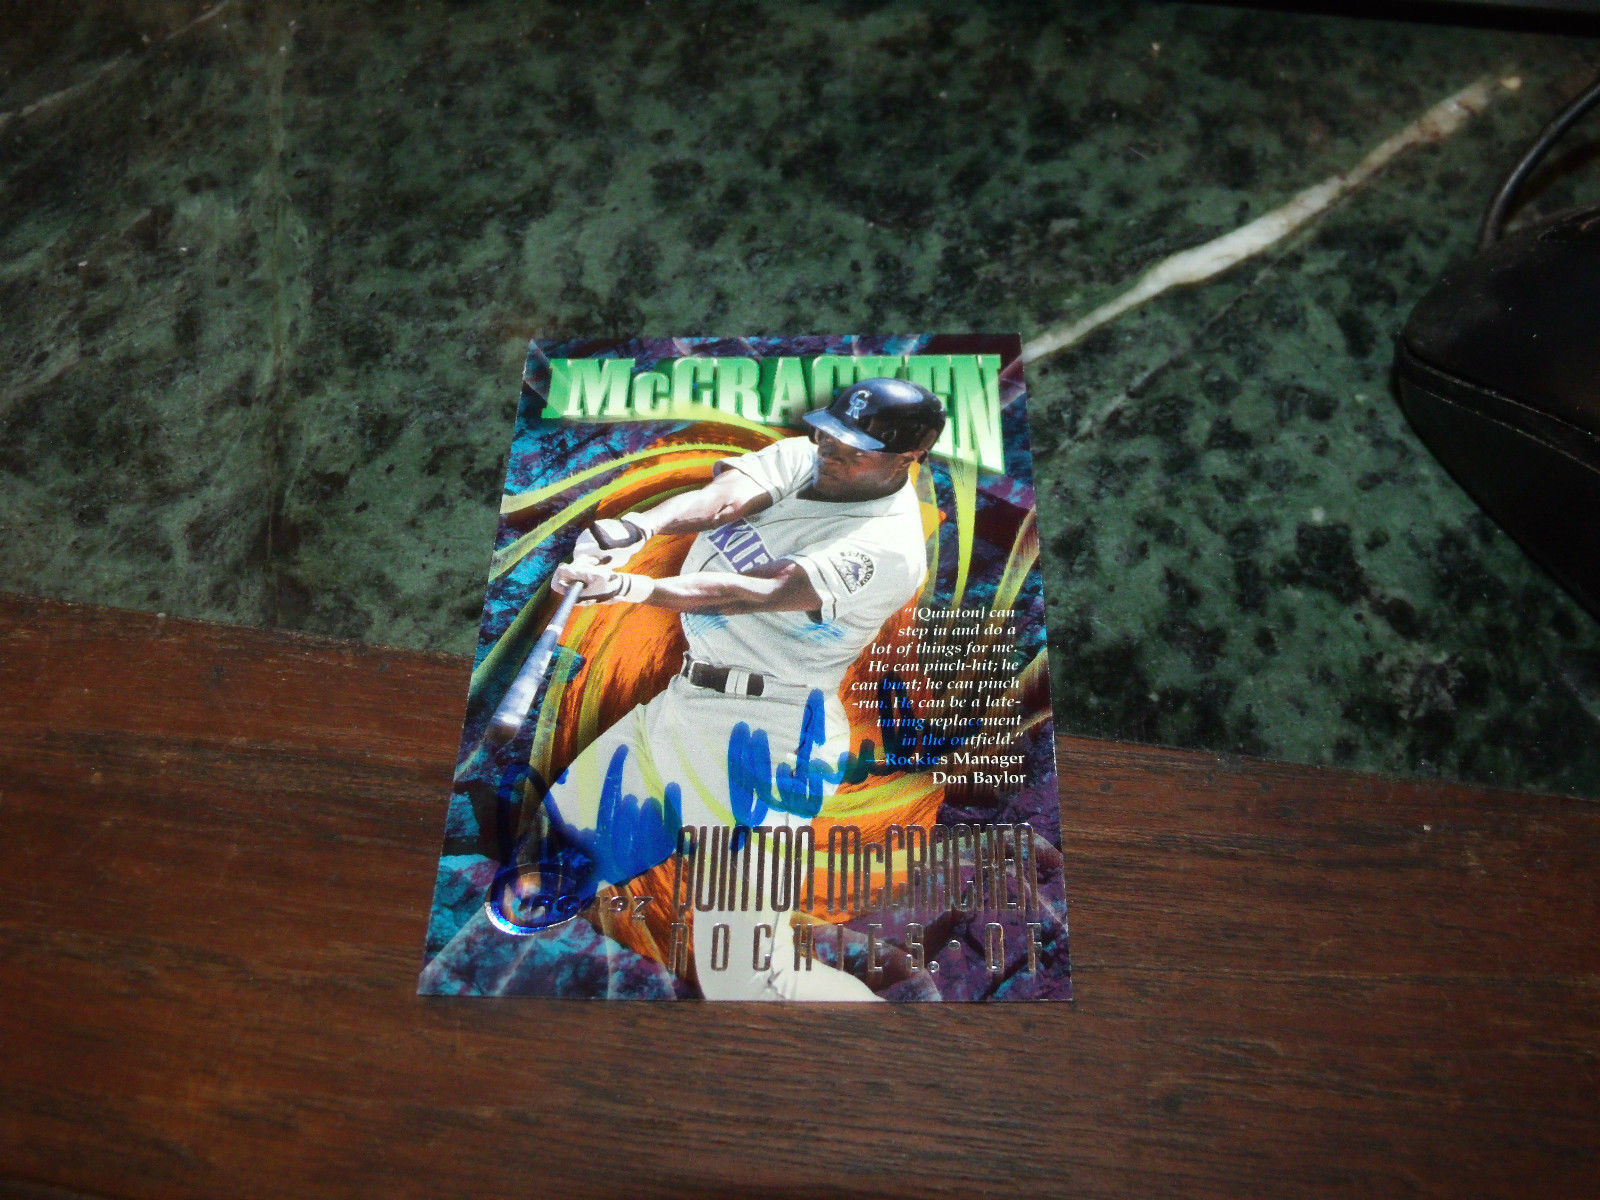 QUINTON MCCRACKEN HAND SIGNED 1997 FLEER CIRCA BASEBALL CARD ROCKIES